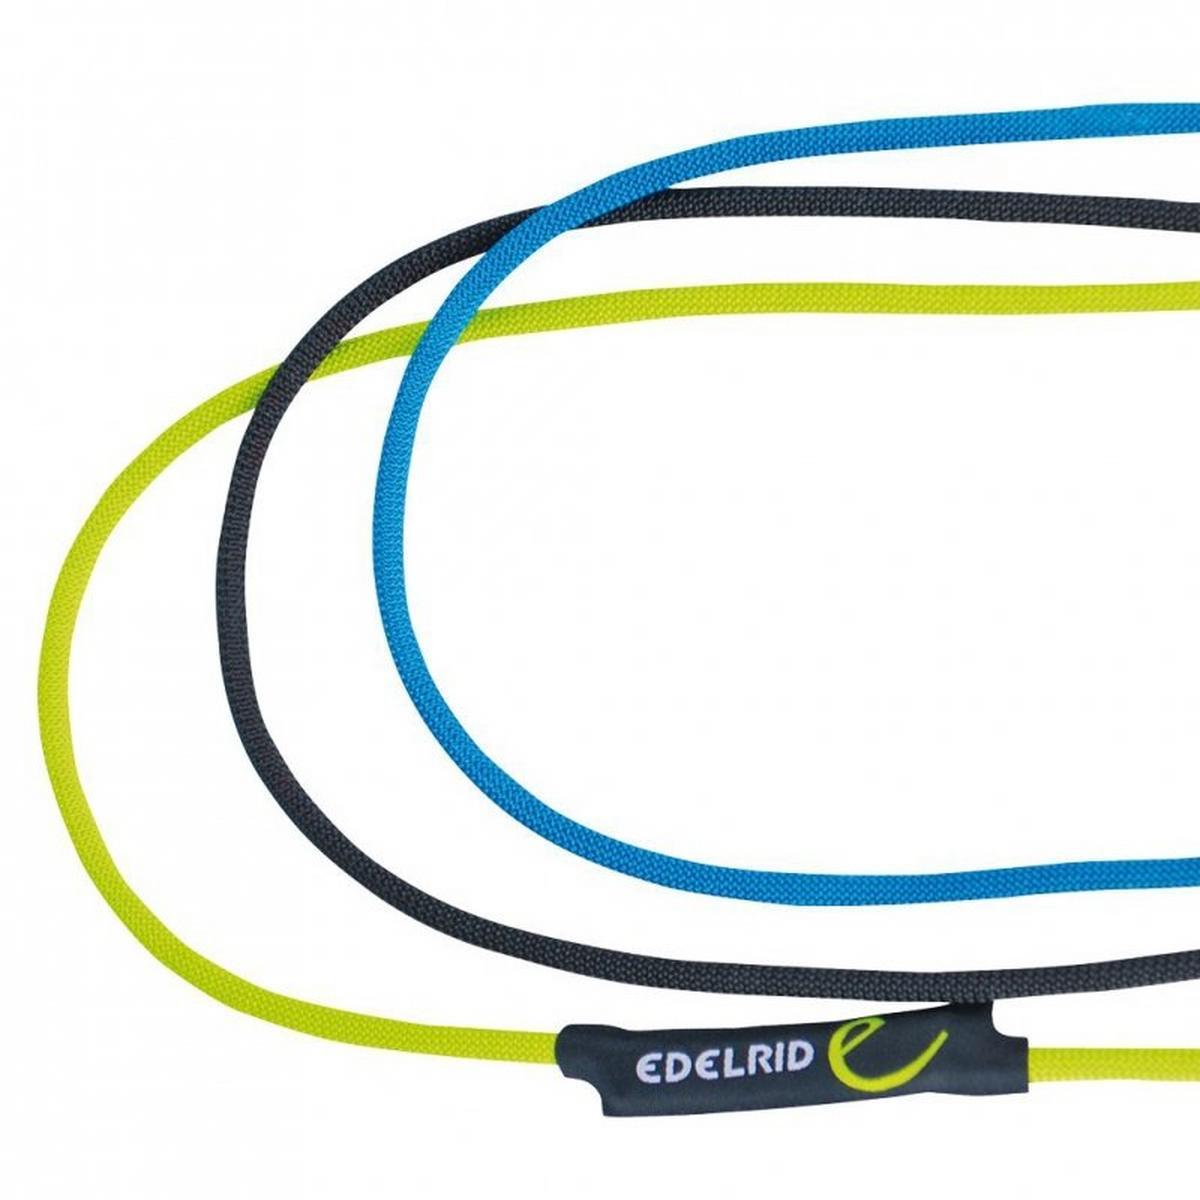 Edelrid Sling Aramid Cord 6 mm x 120 cm Icemint